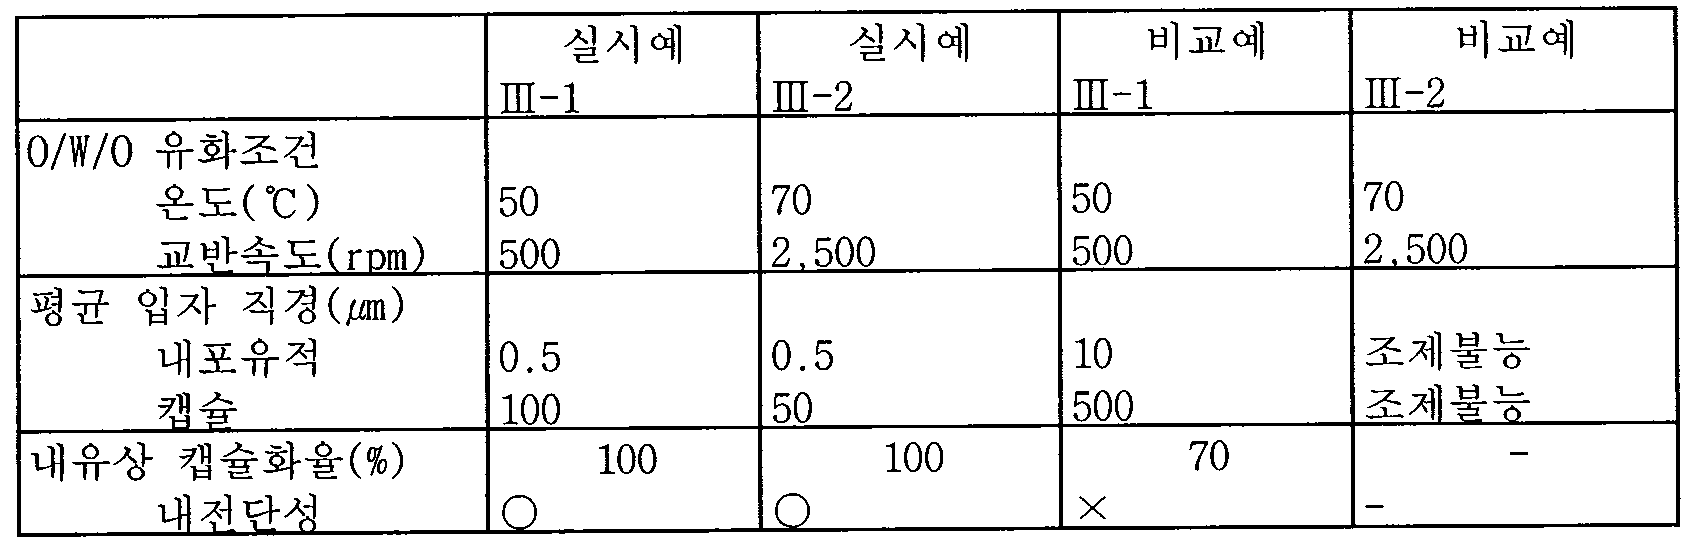 Figure 112005503159226-pat00015